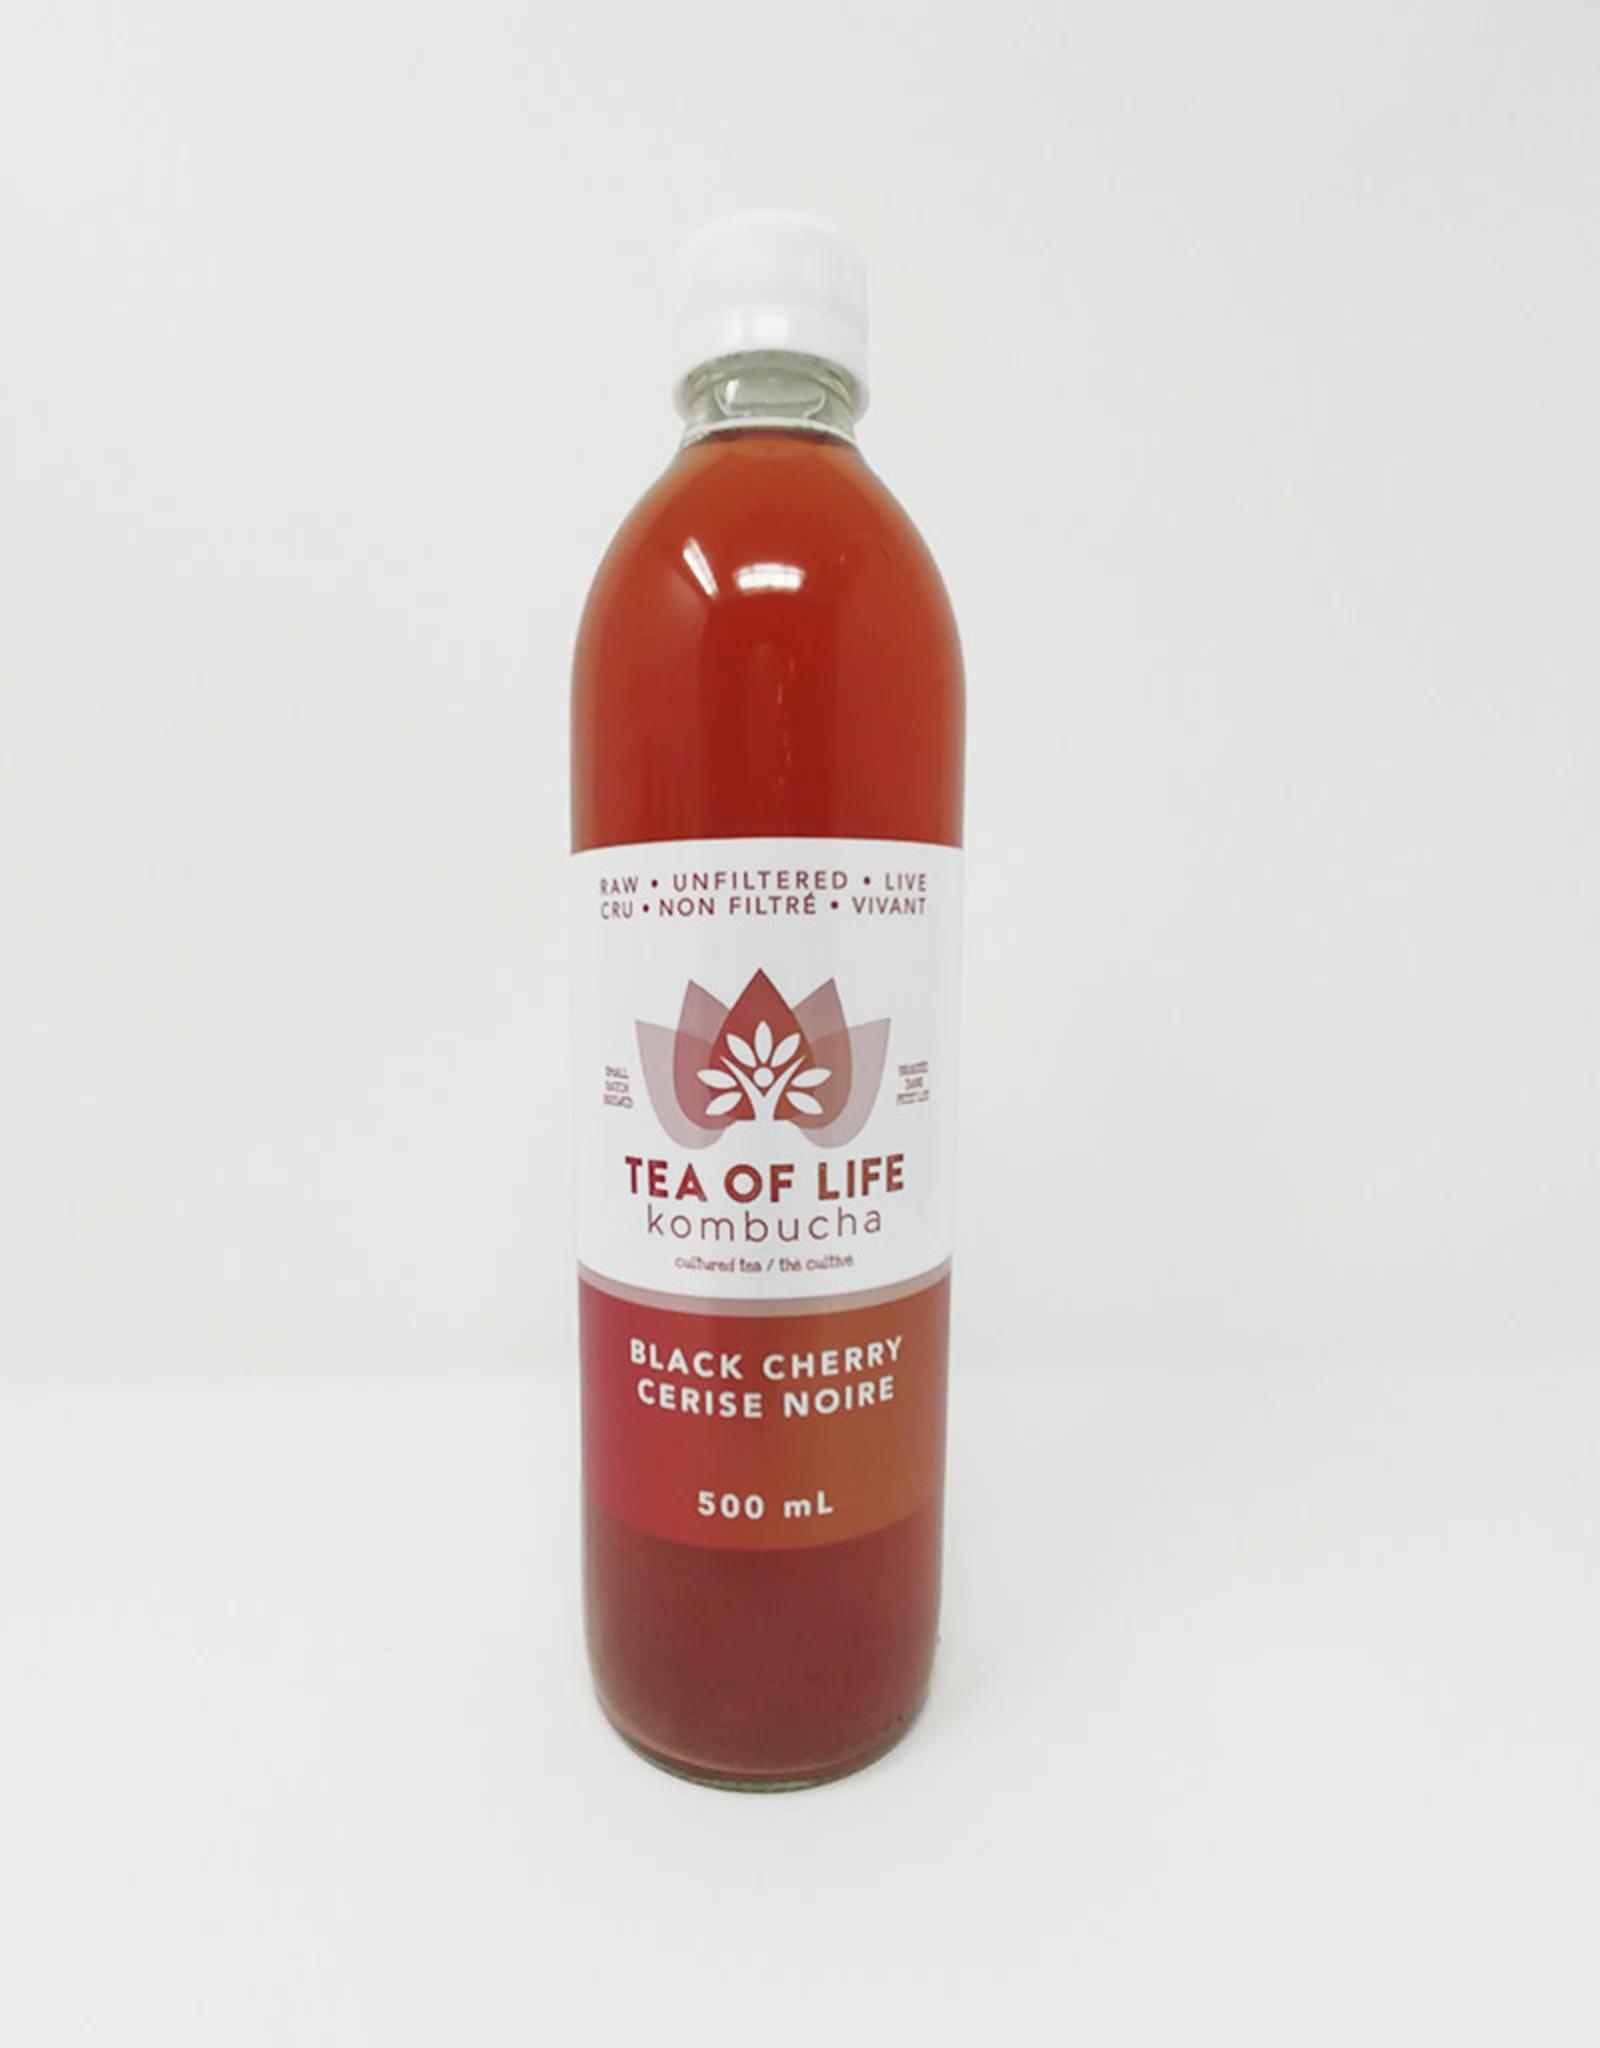 Tea of Life Tea of Life - Kombucha, Black Cherry